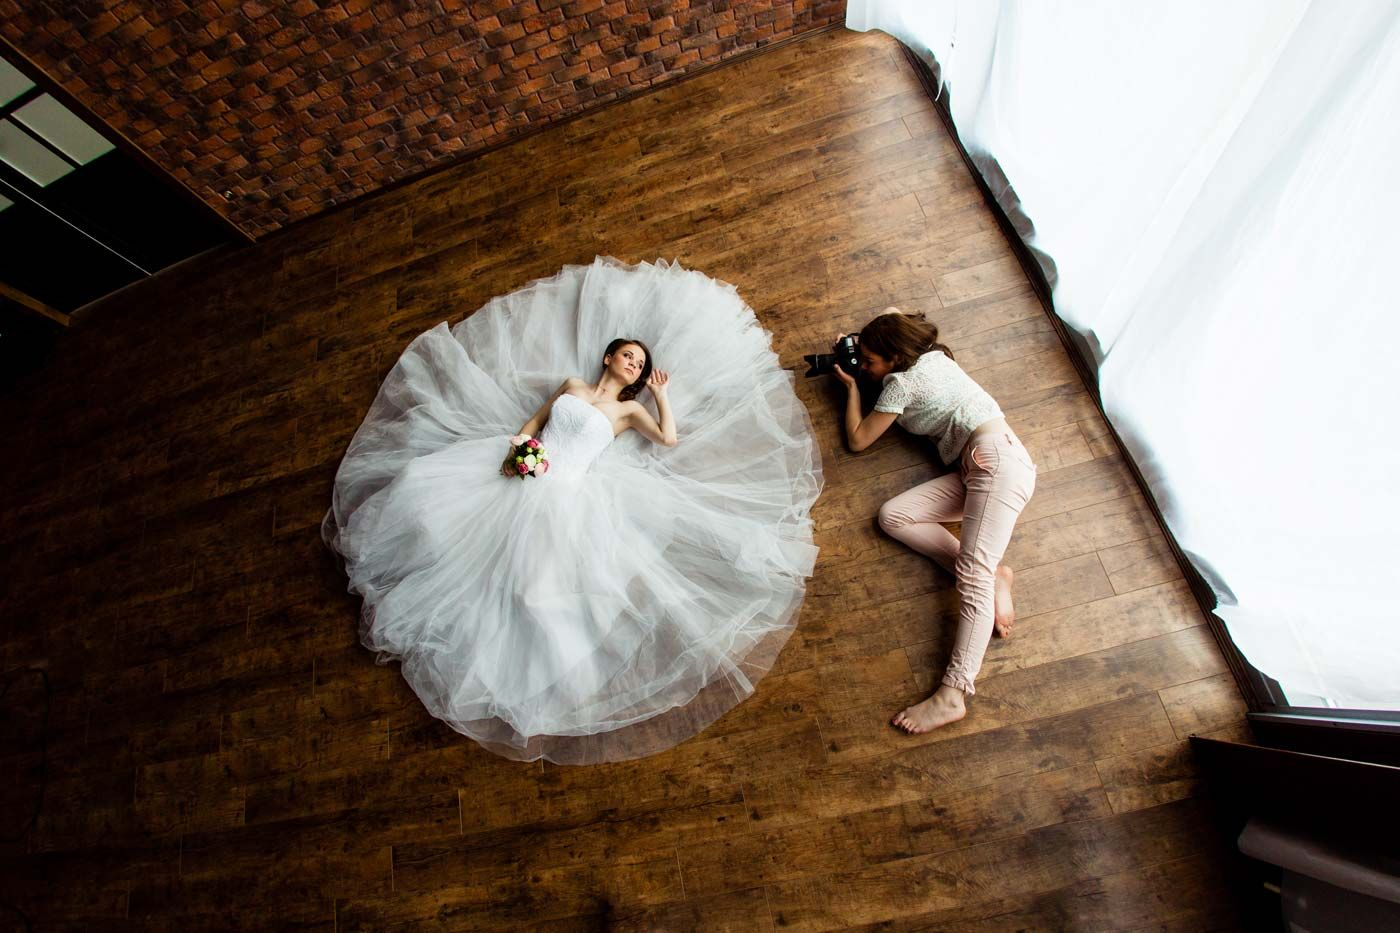 Die Besten Tipps Ideen Fur Fabelhafte Hochzeitsfotos Hochzeitsfotos Hochzeitsfoto Idee Und Hochzeit Fotografieren